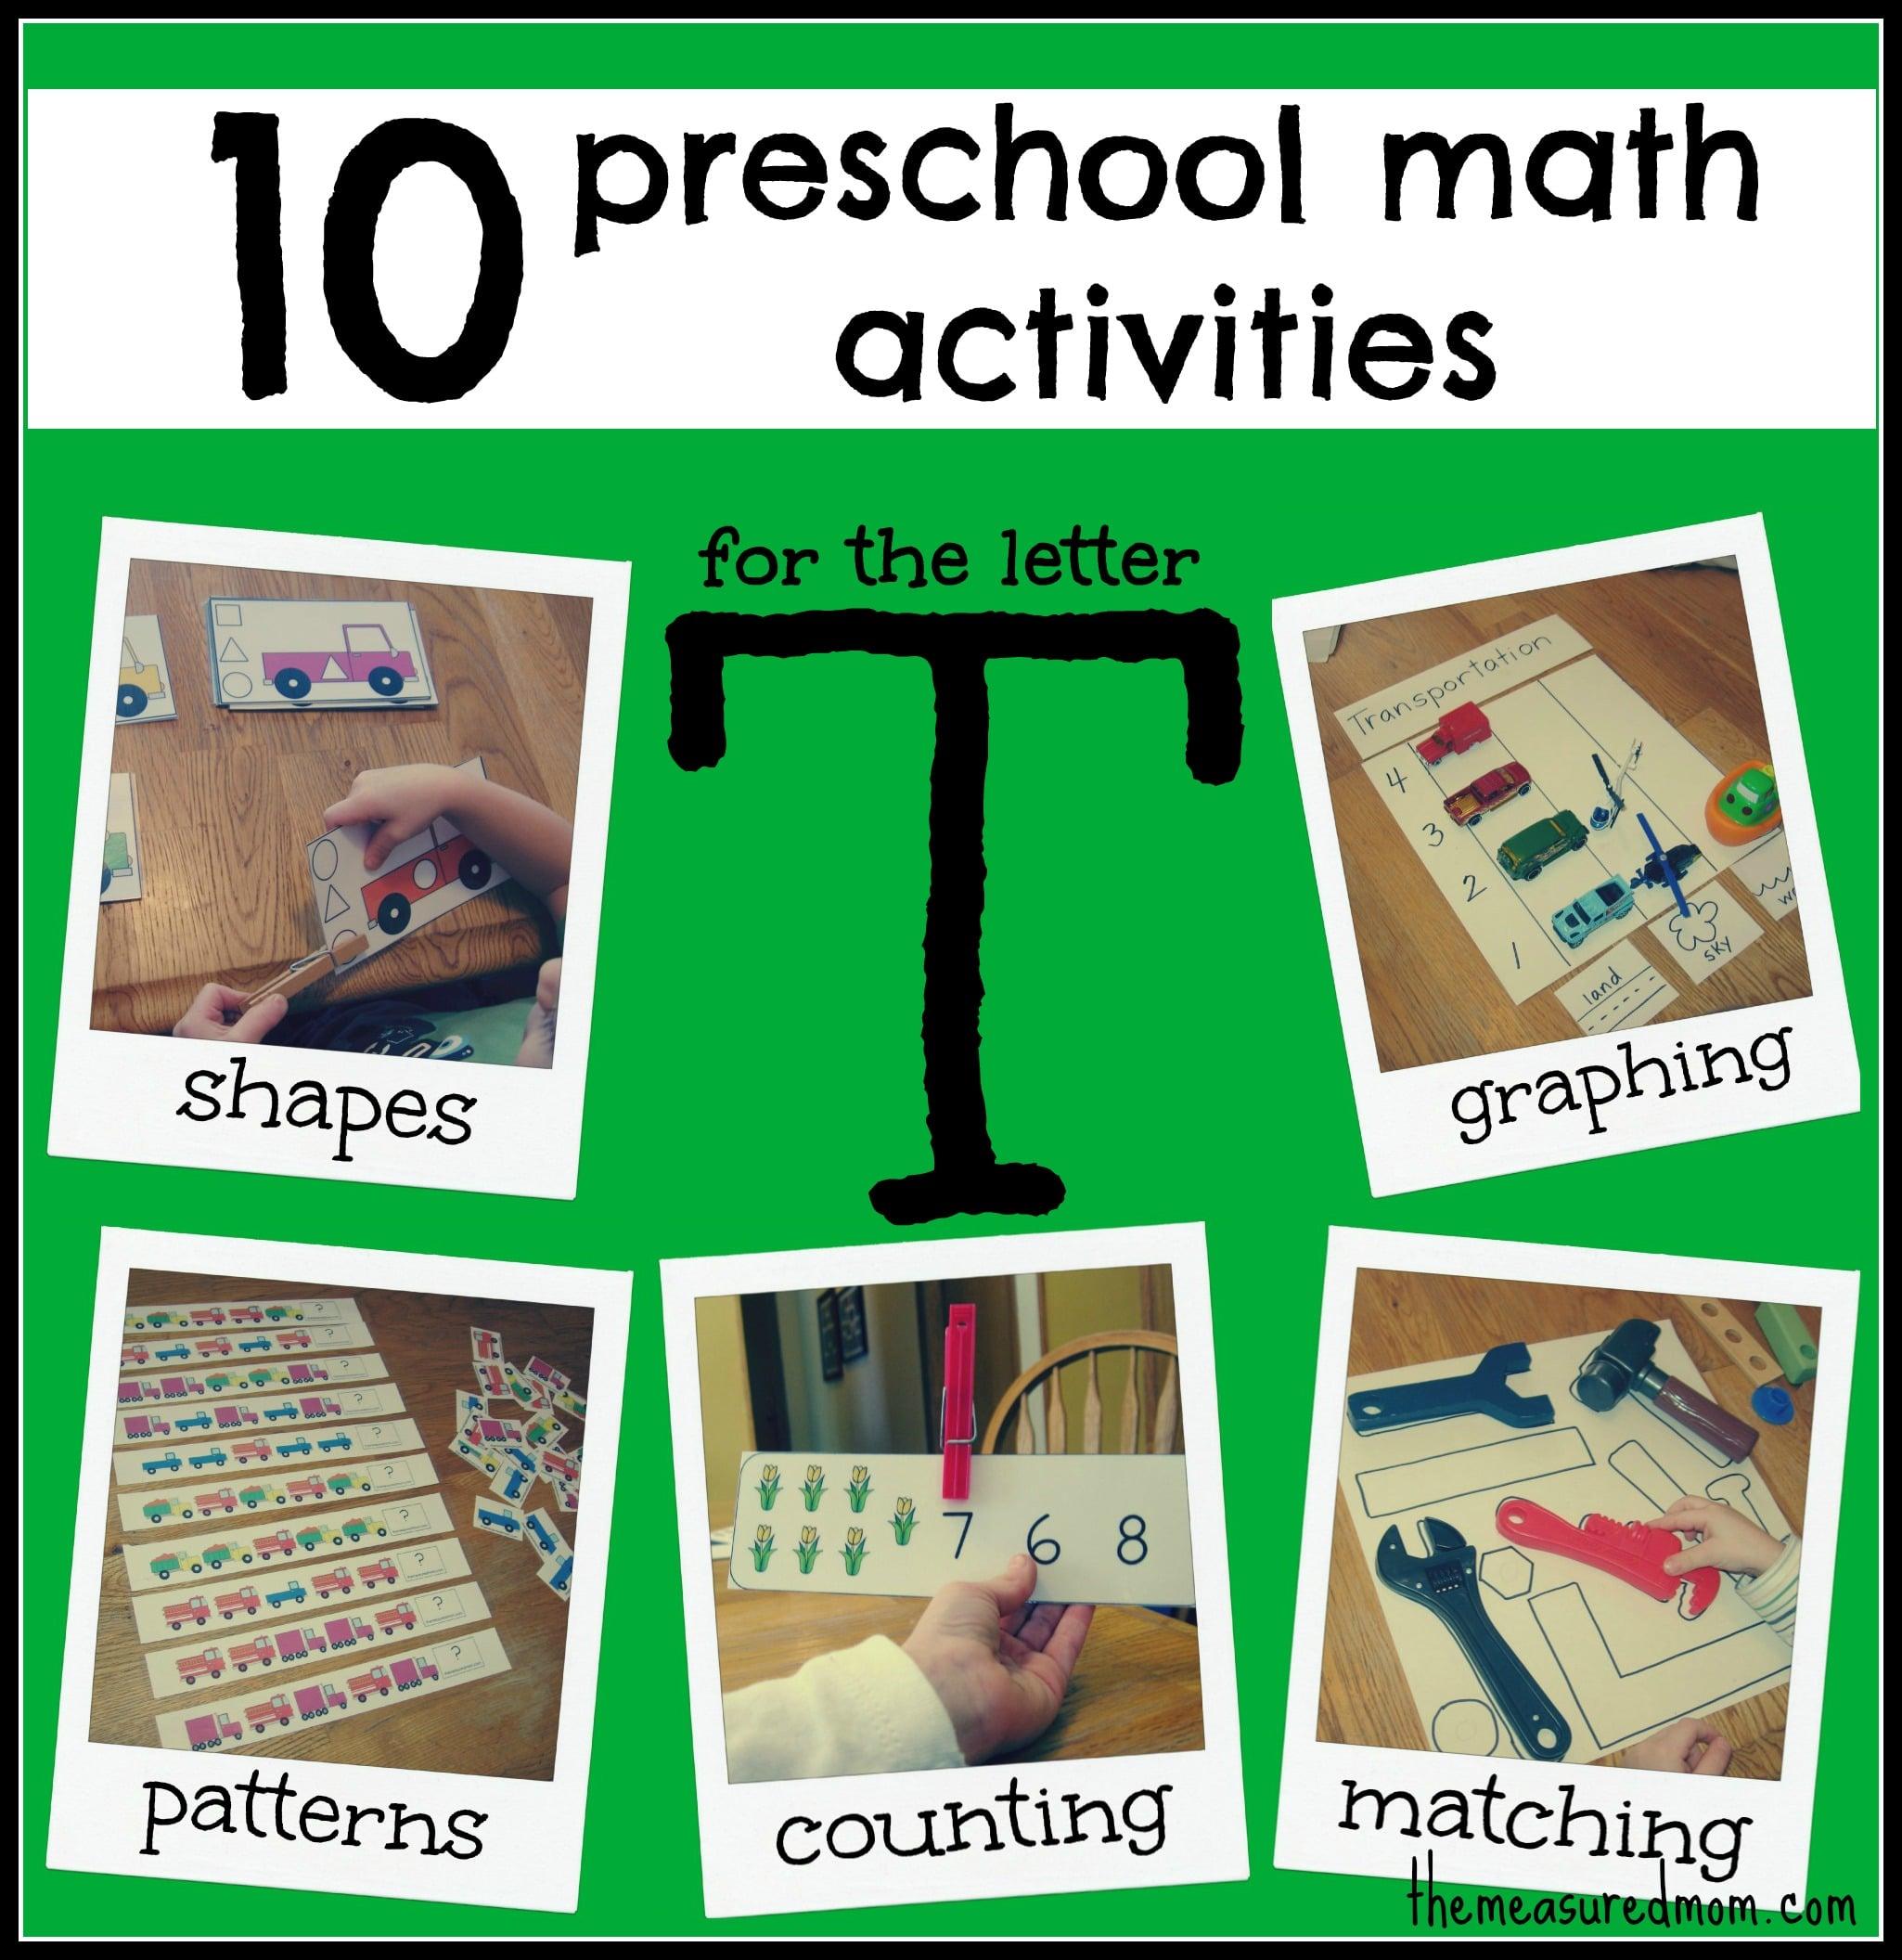 preschool math videos 10 preschool math activities the letter t the measured 543